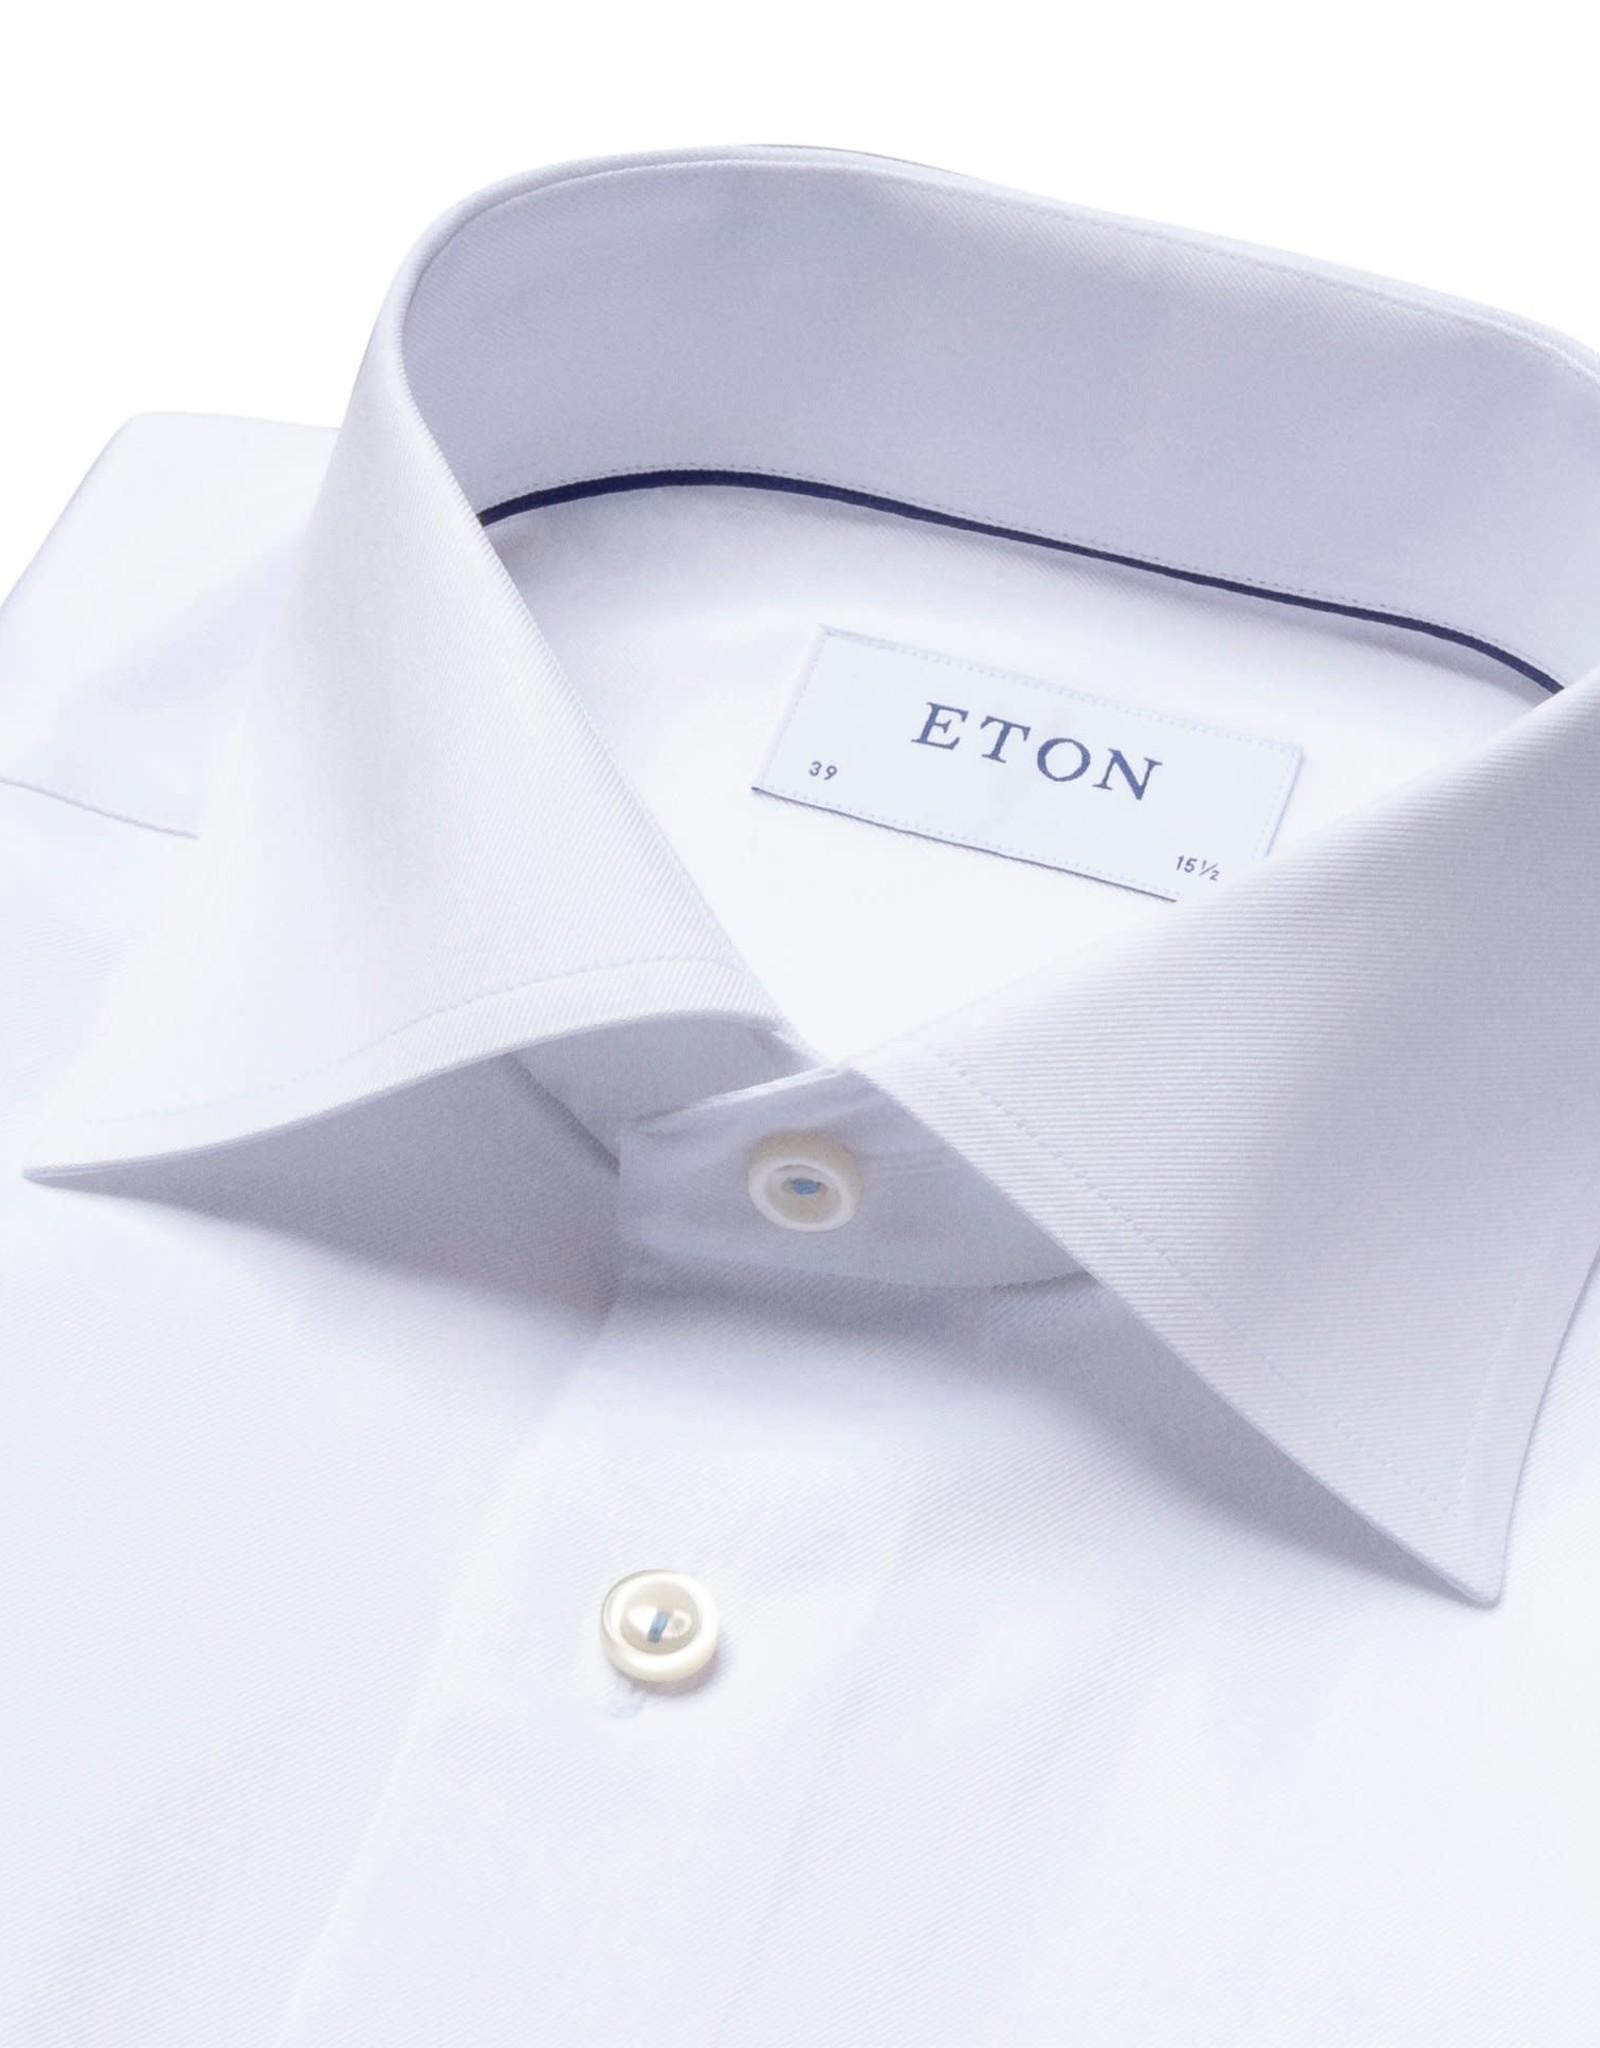 Eton Eton hemd wit contemporary 1050/01